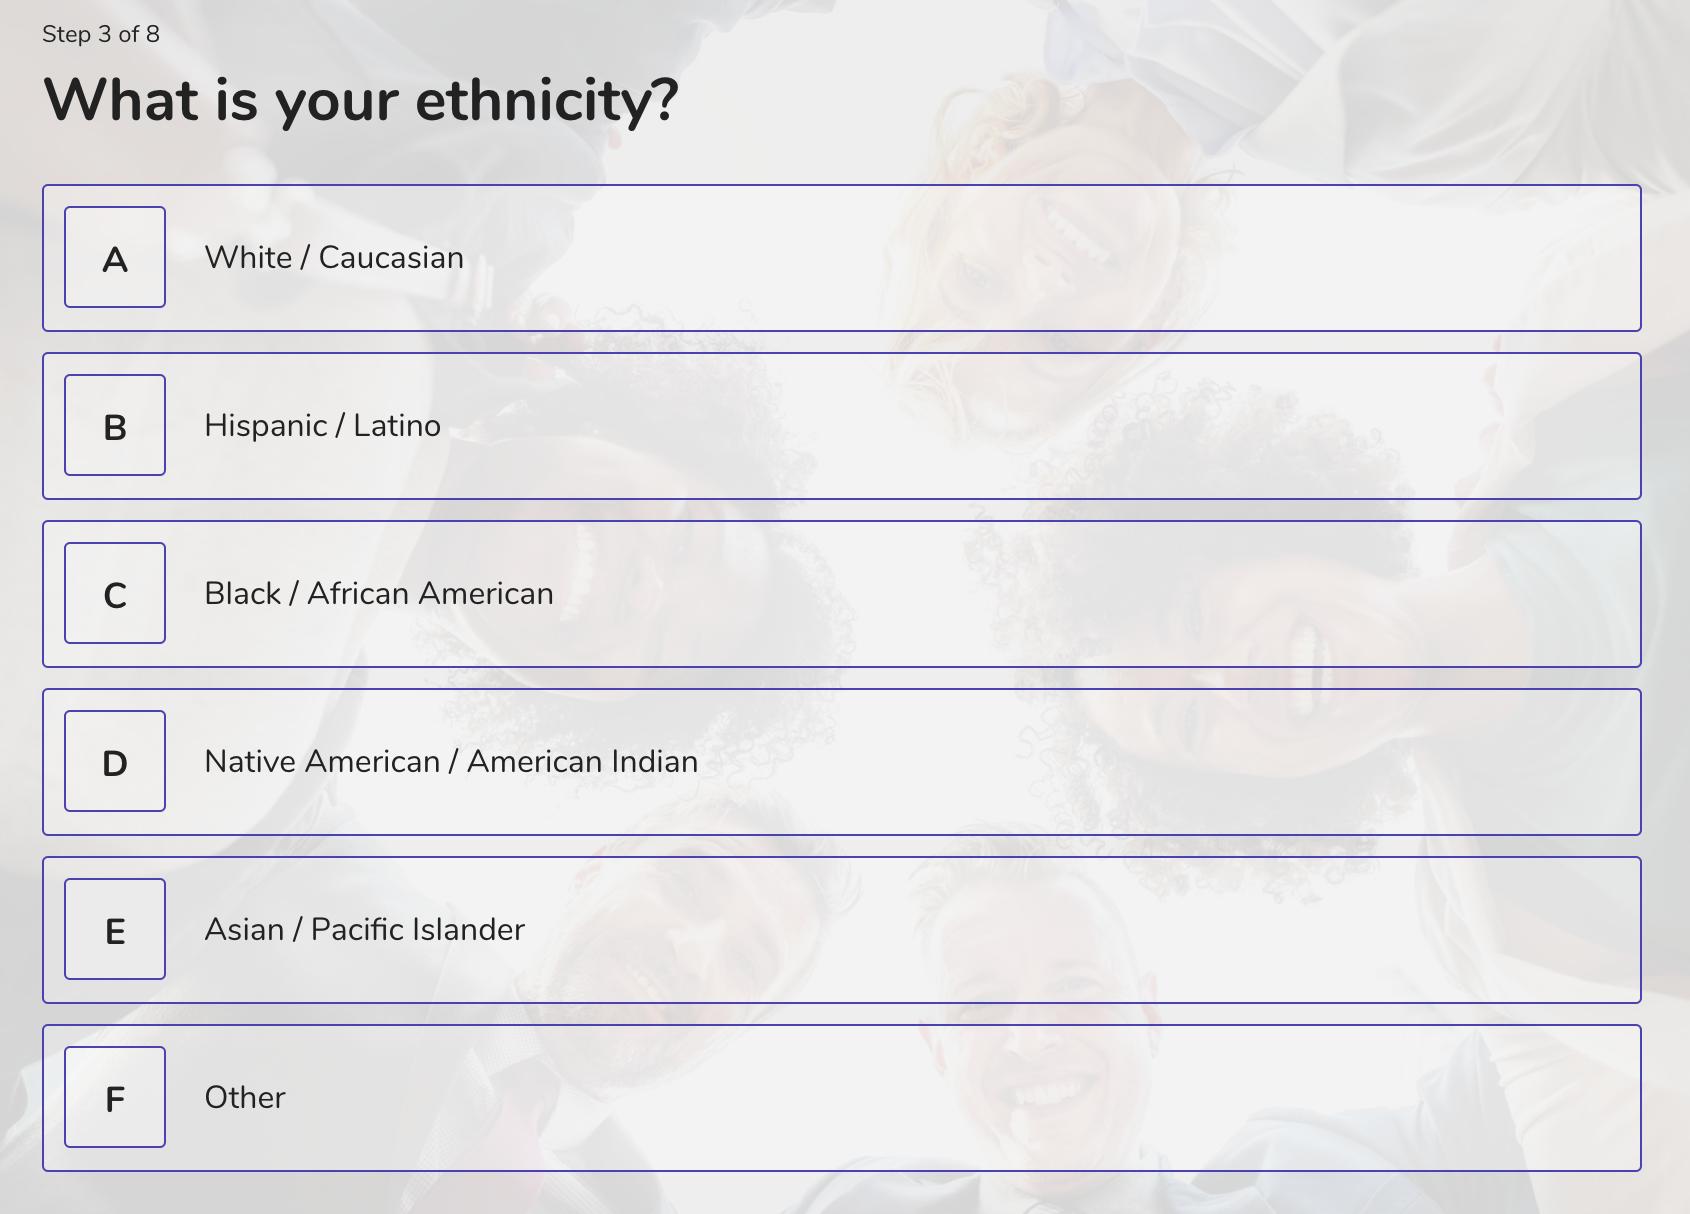 demographic question example - ethnicity